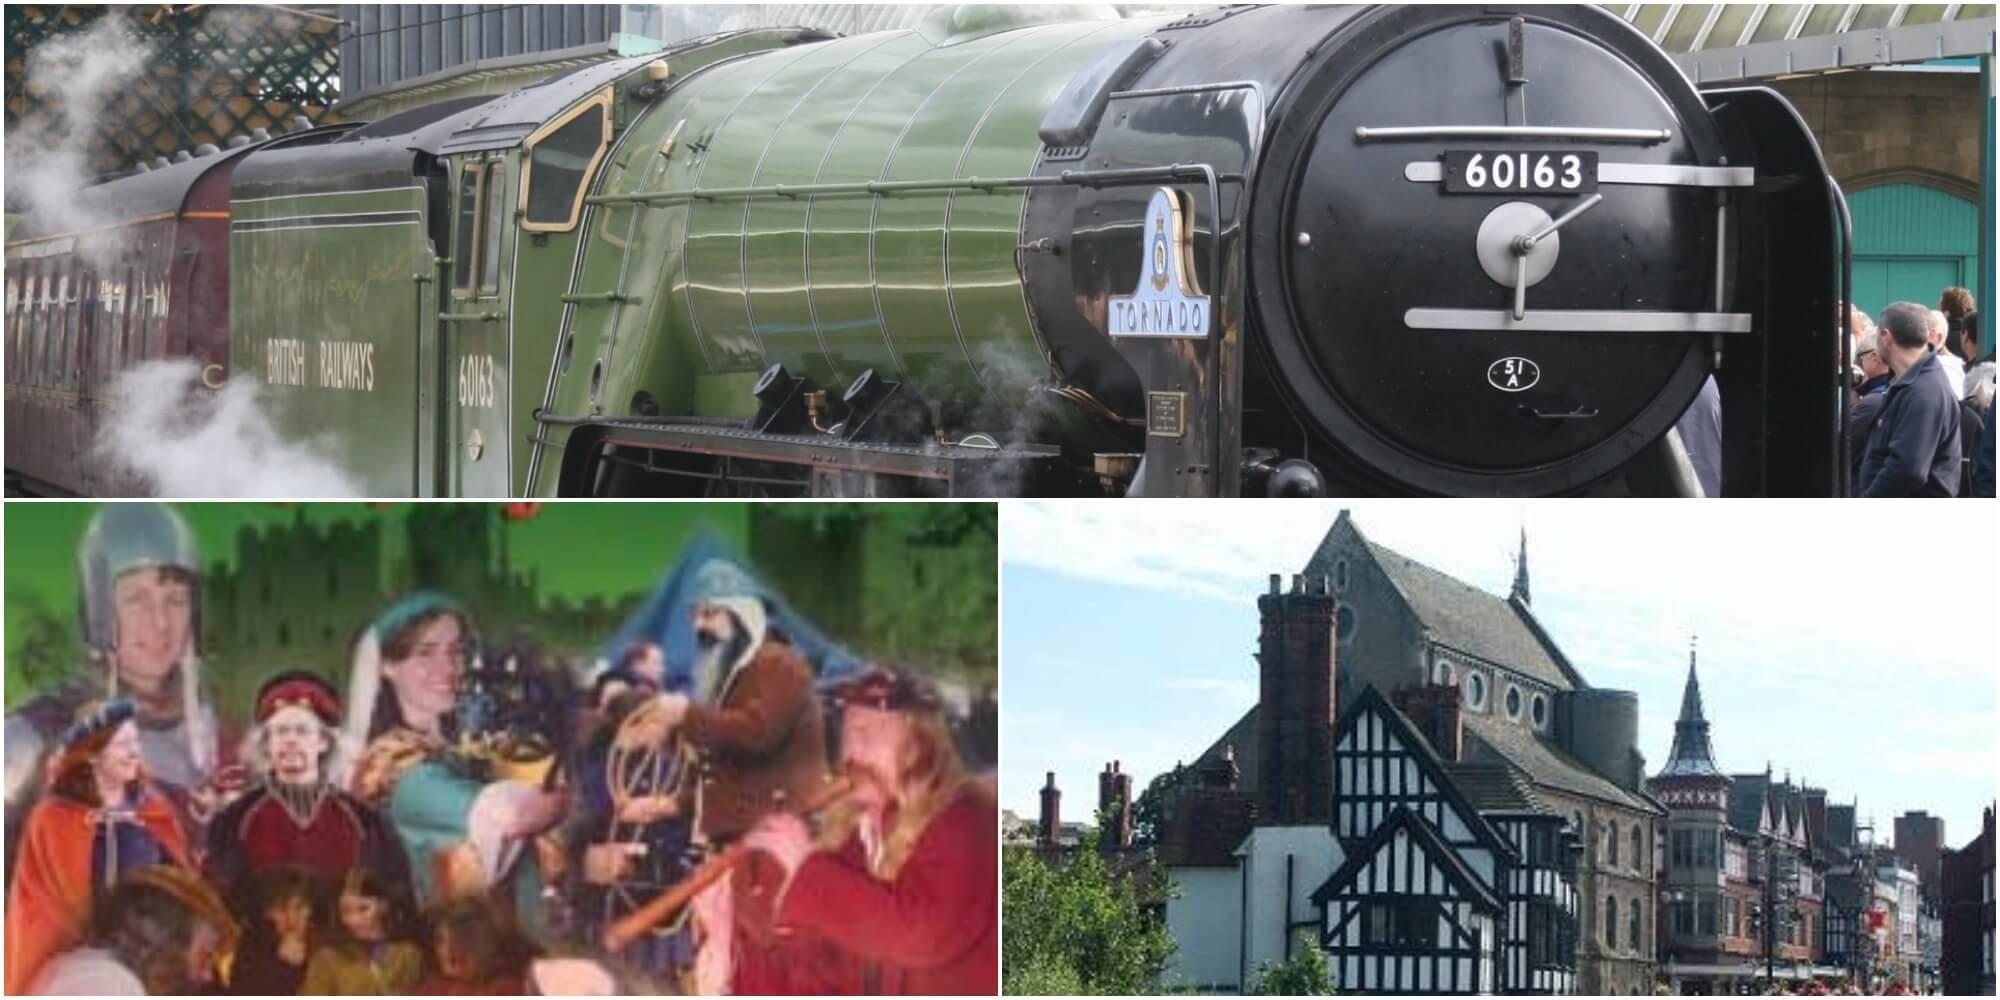 No 60163 Tornado, Ludlow Medieval Christmas Fayre & Shrewsbury